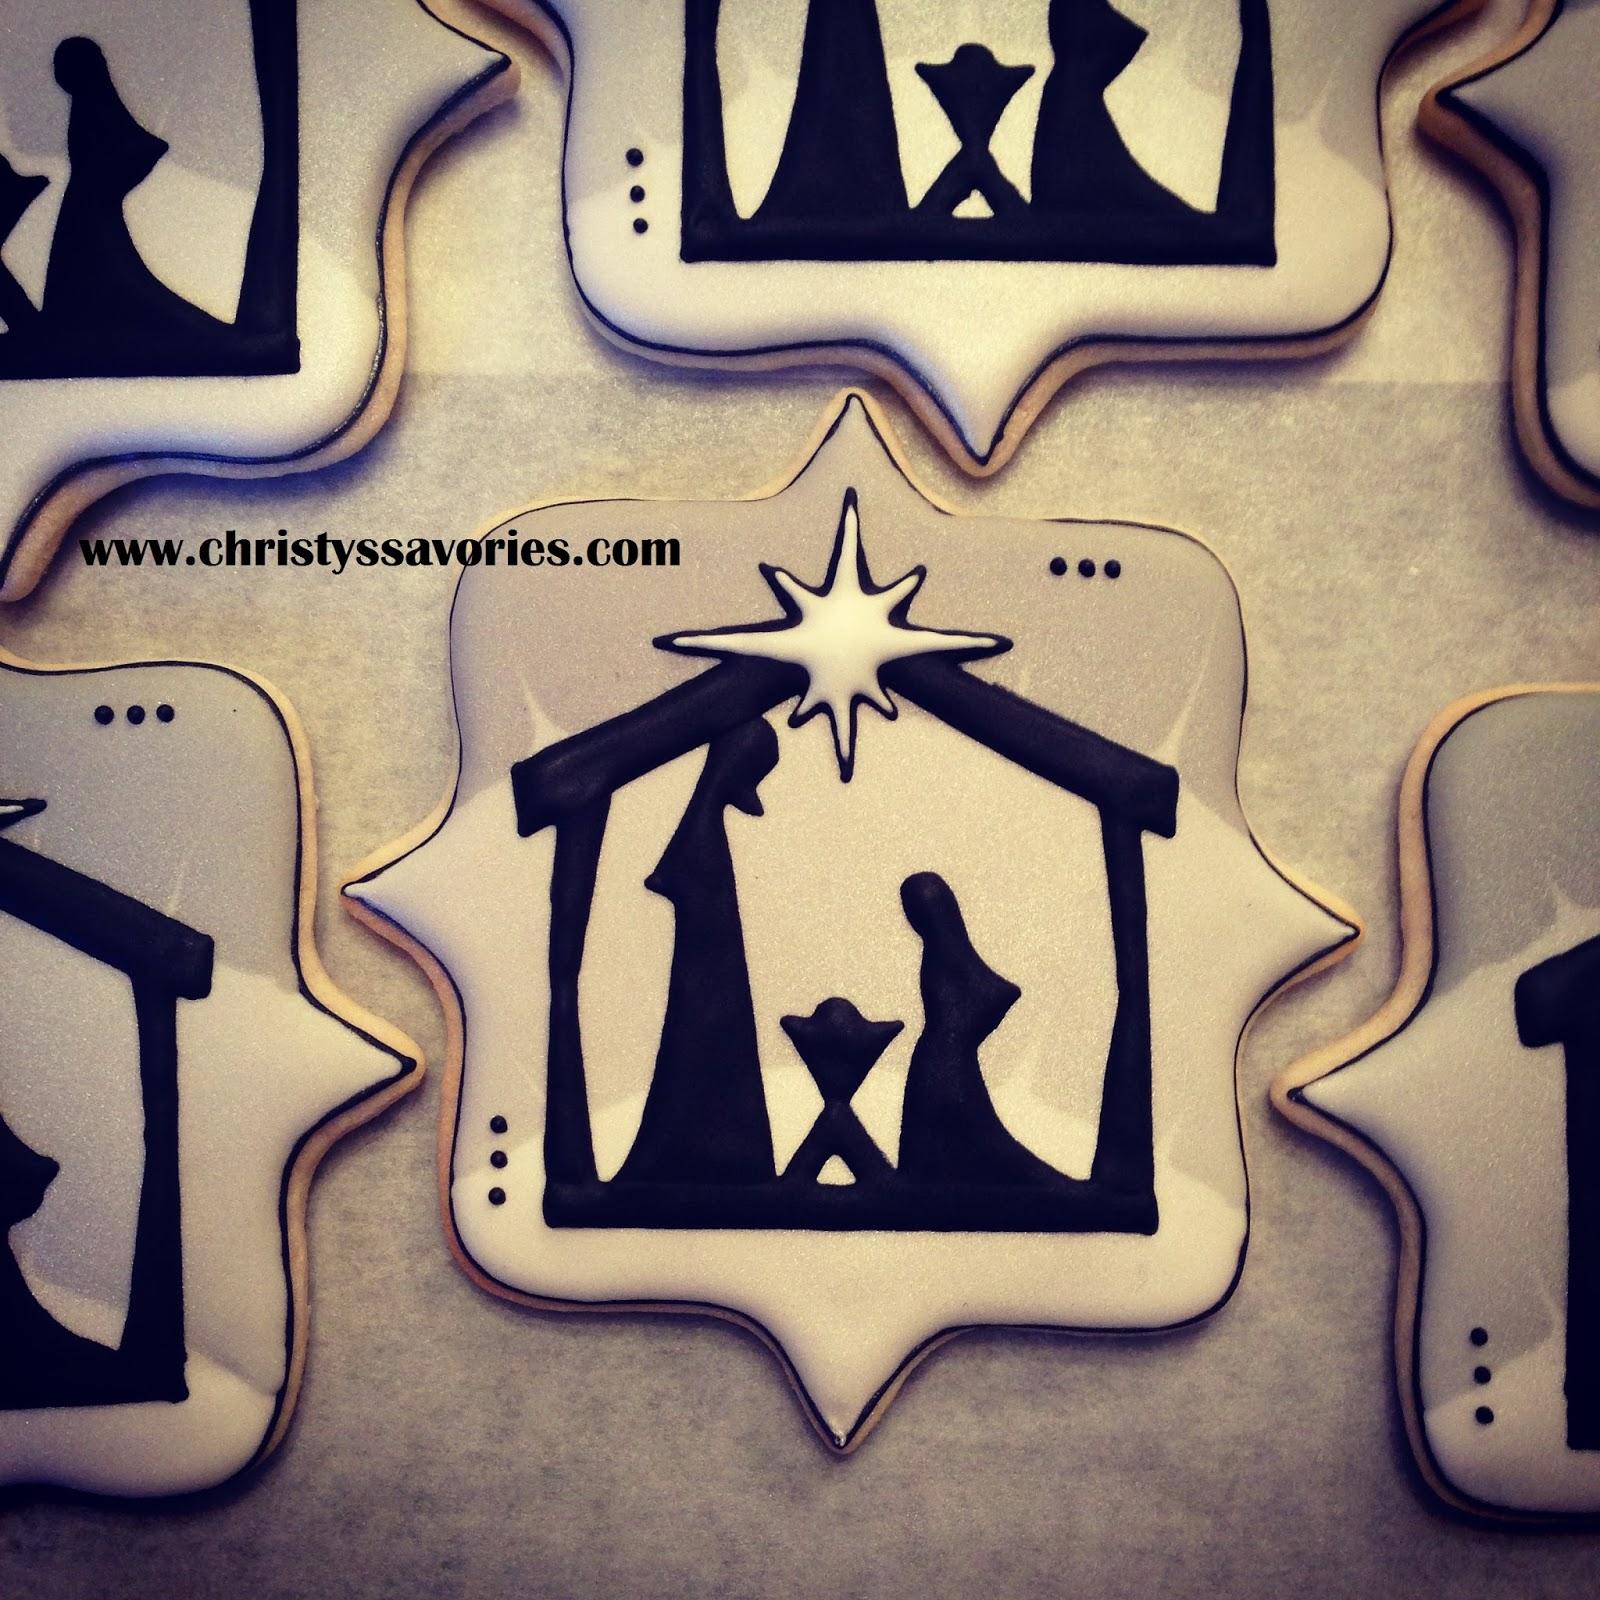 Christy S Savories Nativity Cookies